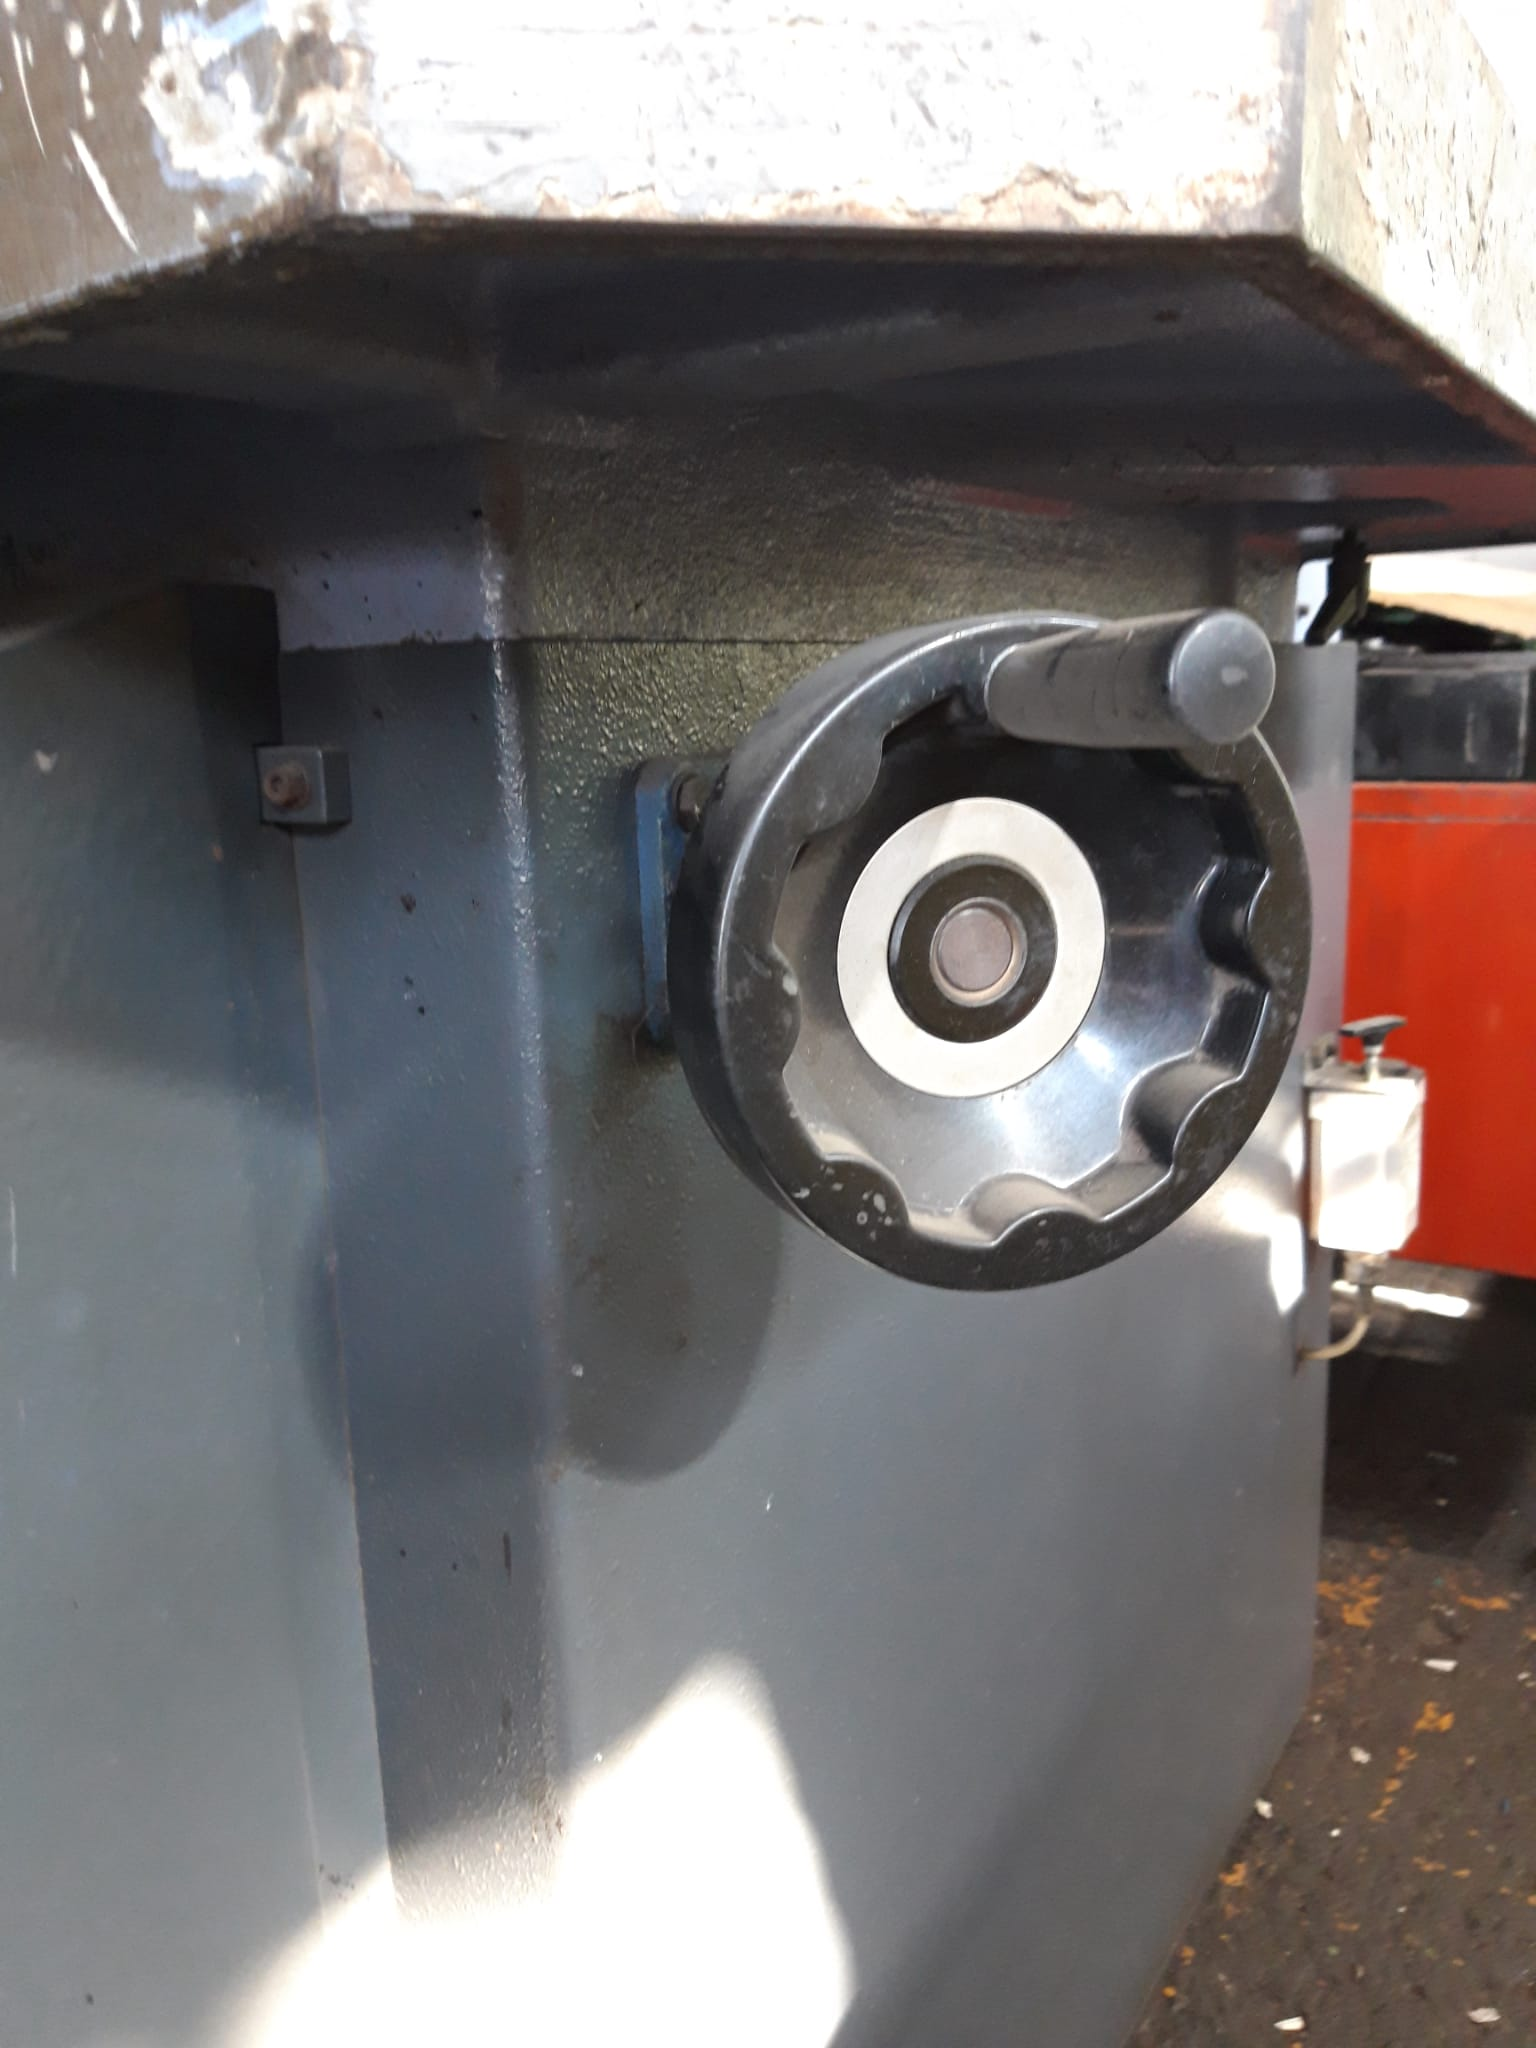 Scantonatrice idraulica Comaca var 250 in vendita - foto 3